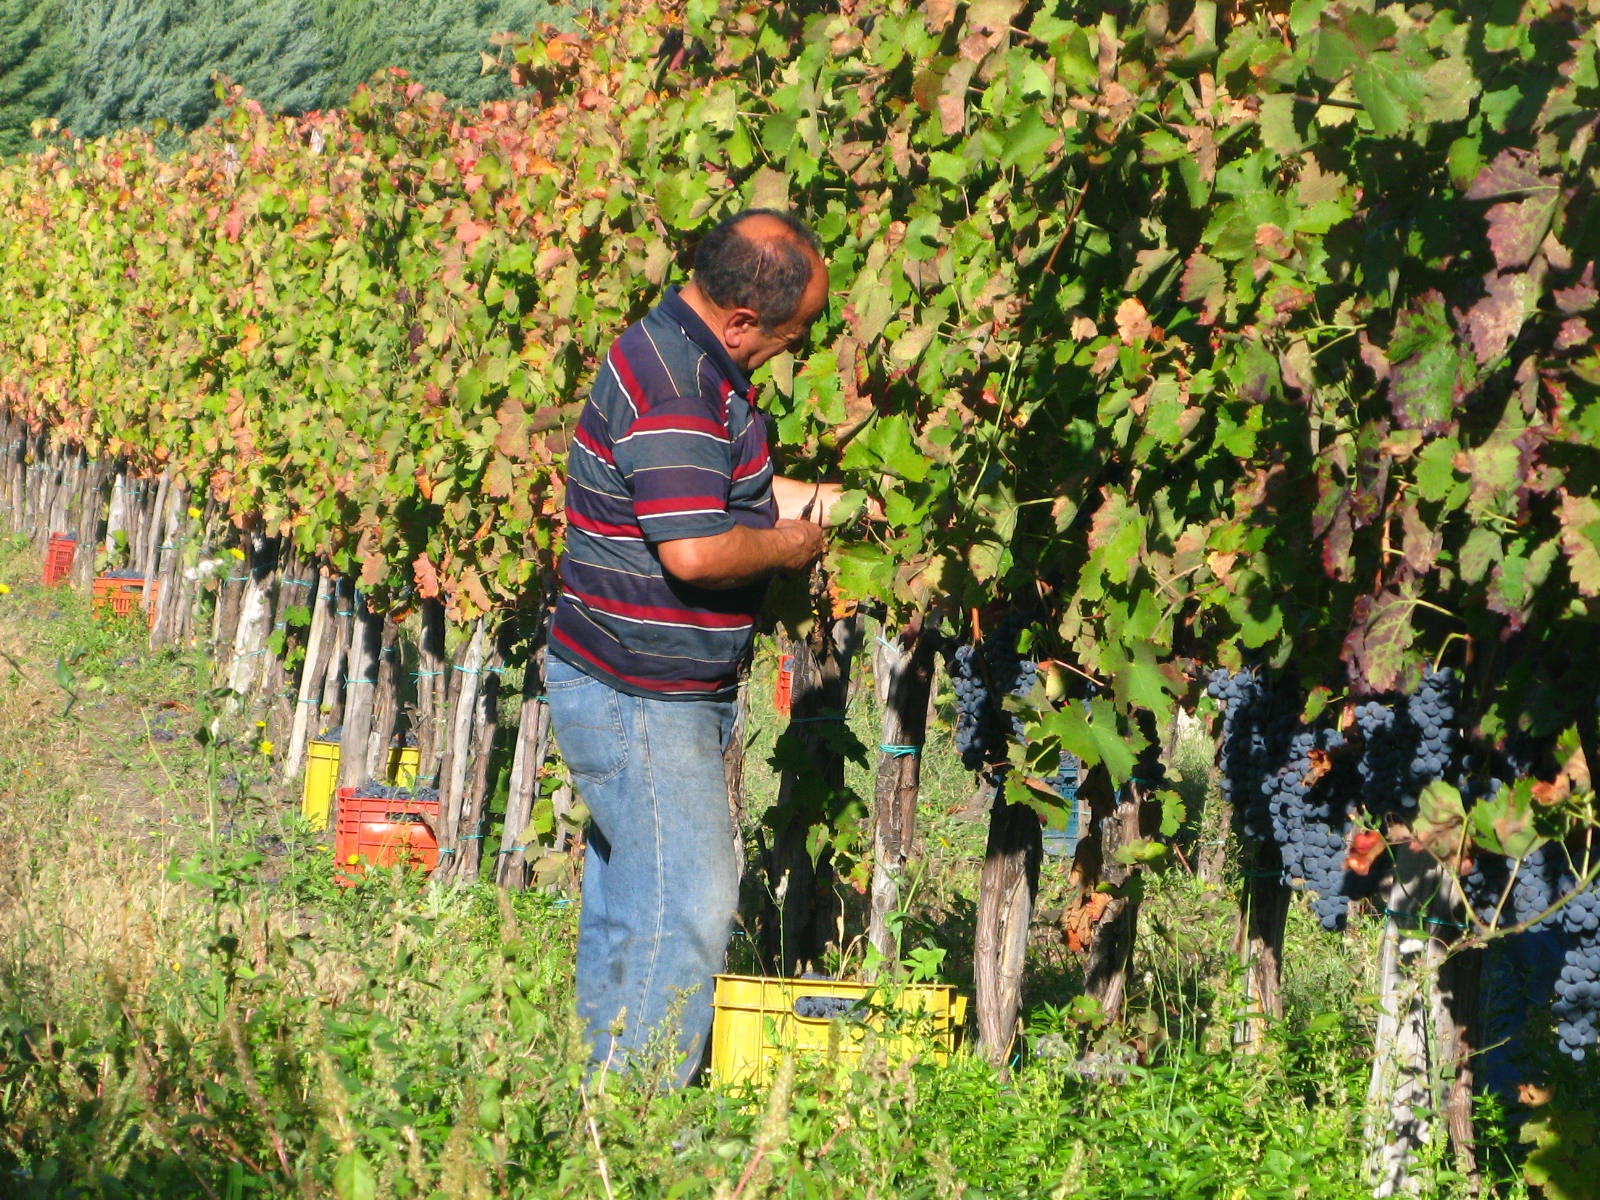 winemaker at Stefania Barbot vineyard at work